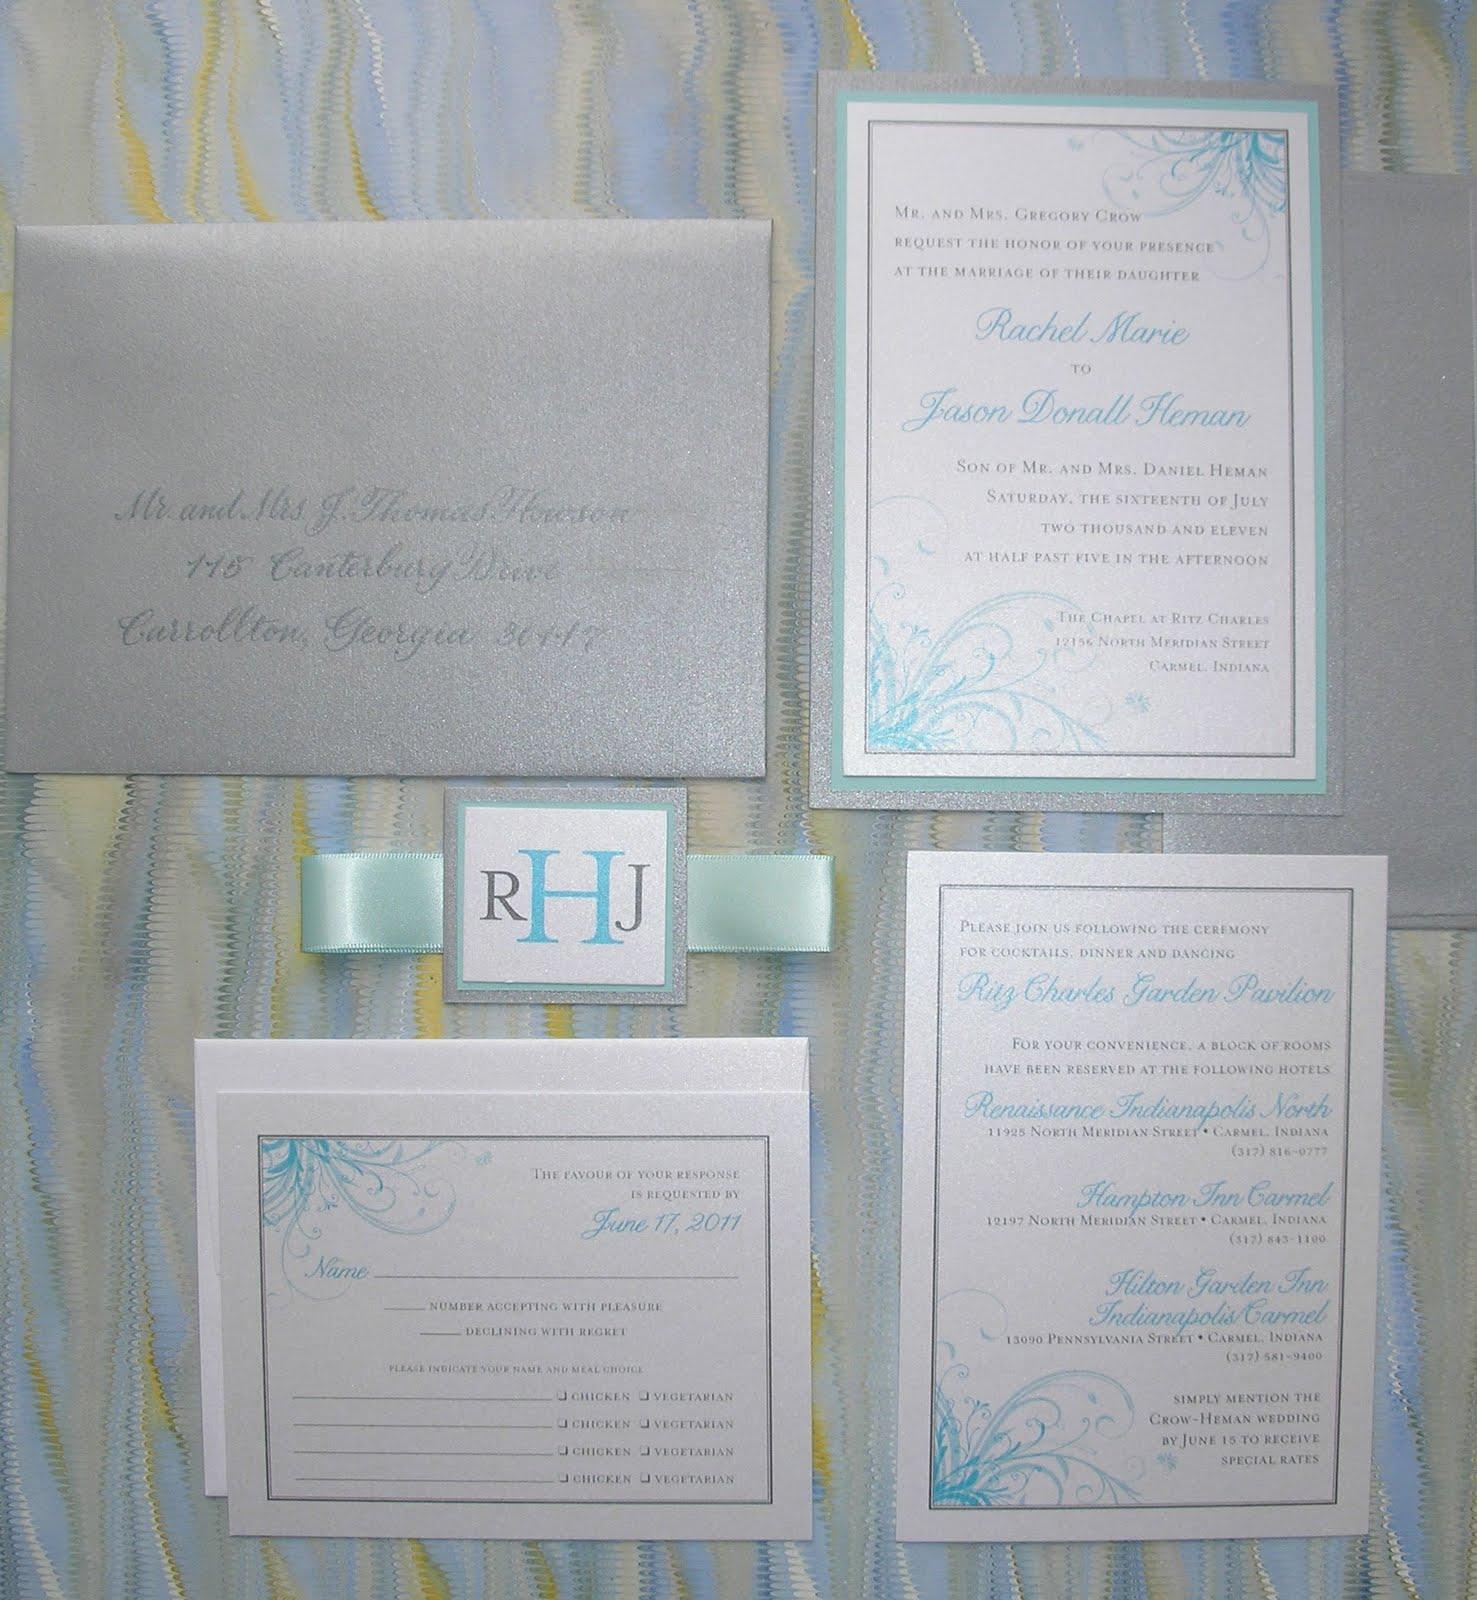 Wedding Invitations Indianapolis: Wedding Calligraphy By Jane Farr: Indianapolis Wedding